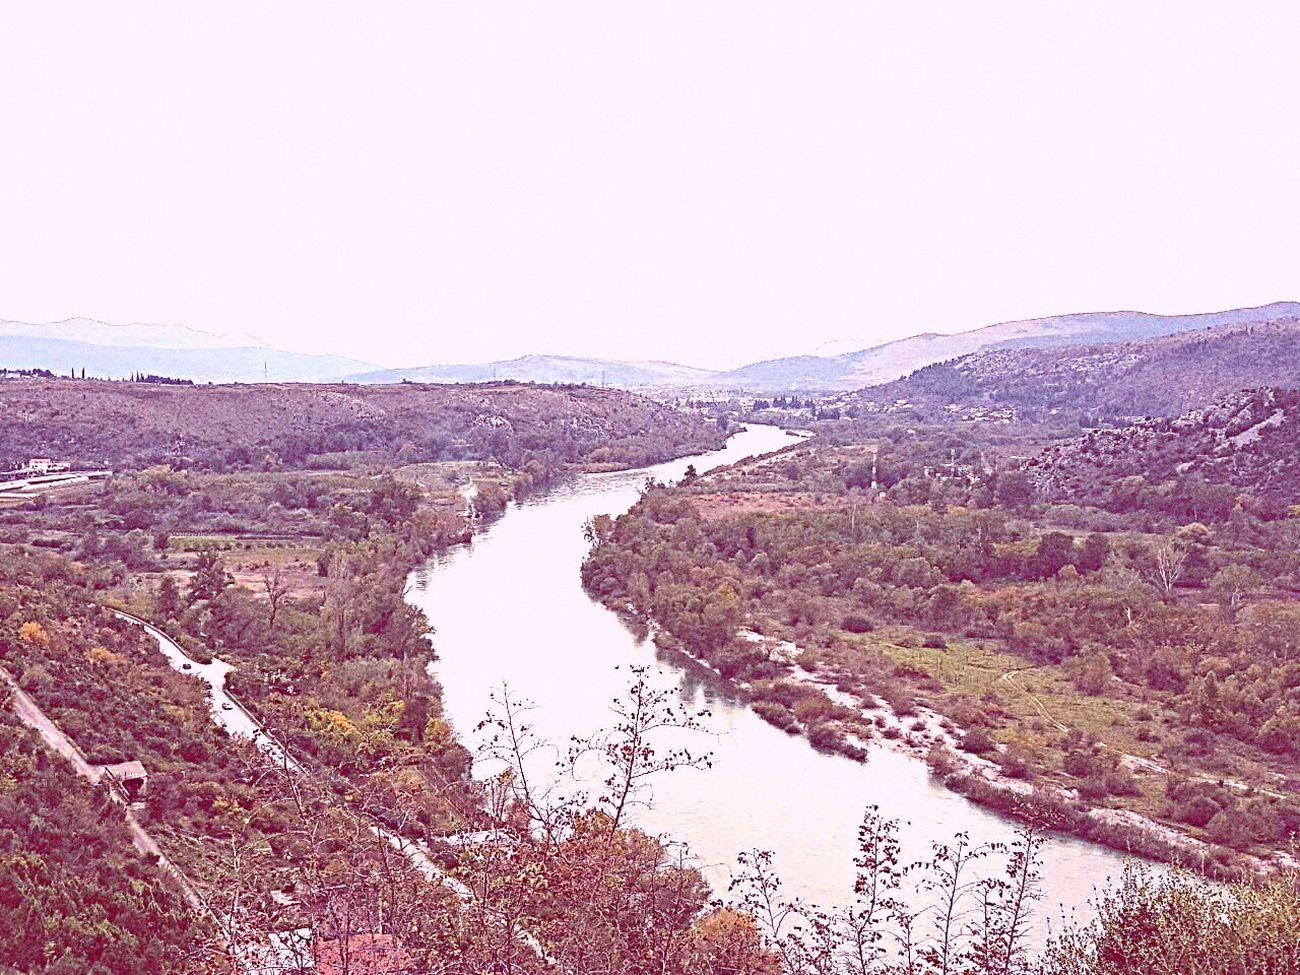 Outside Photography Nature River Tree Outdoors No People Day Naturel Rijeka Doğa Water Nehir Manzara Hoş Saf